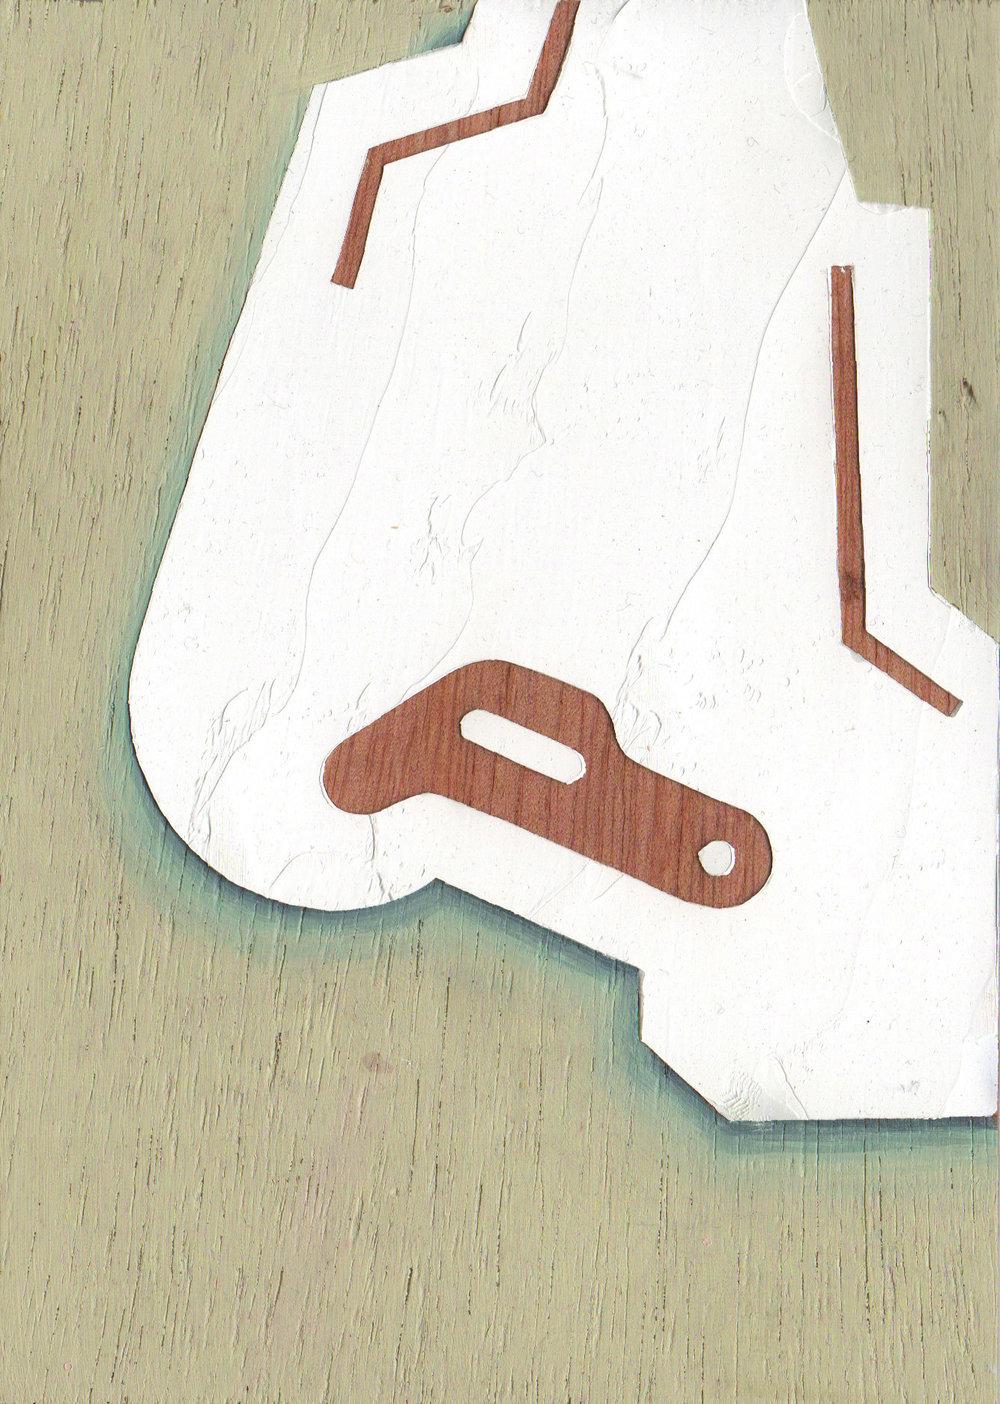 Karten_7-12x16cm-acylic-on-wood.jpg